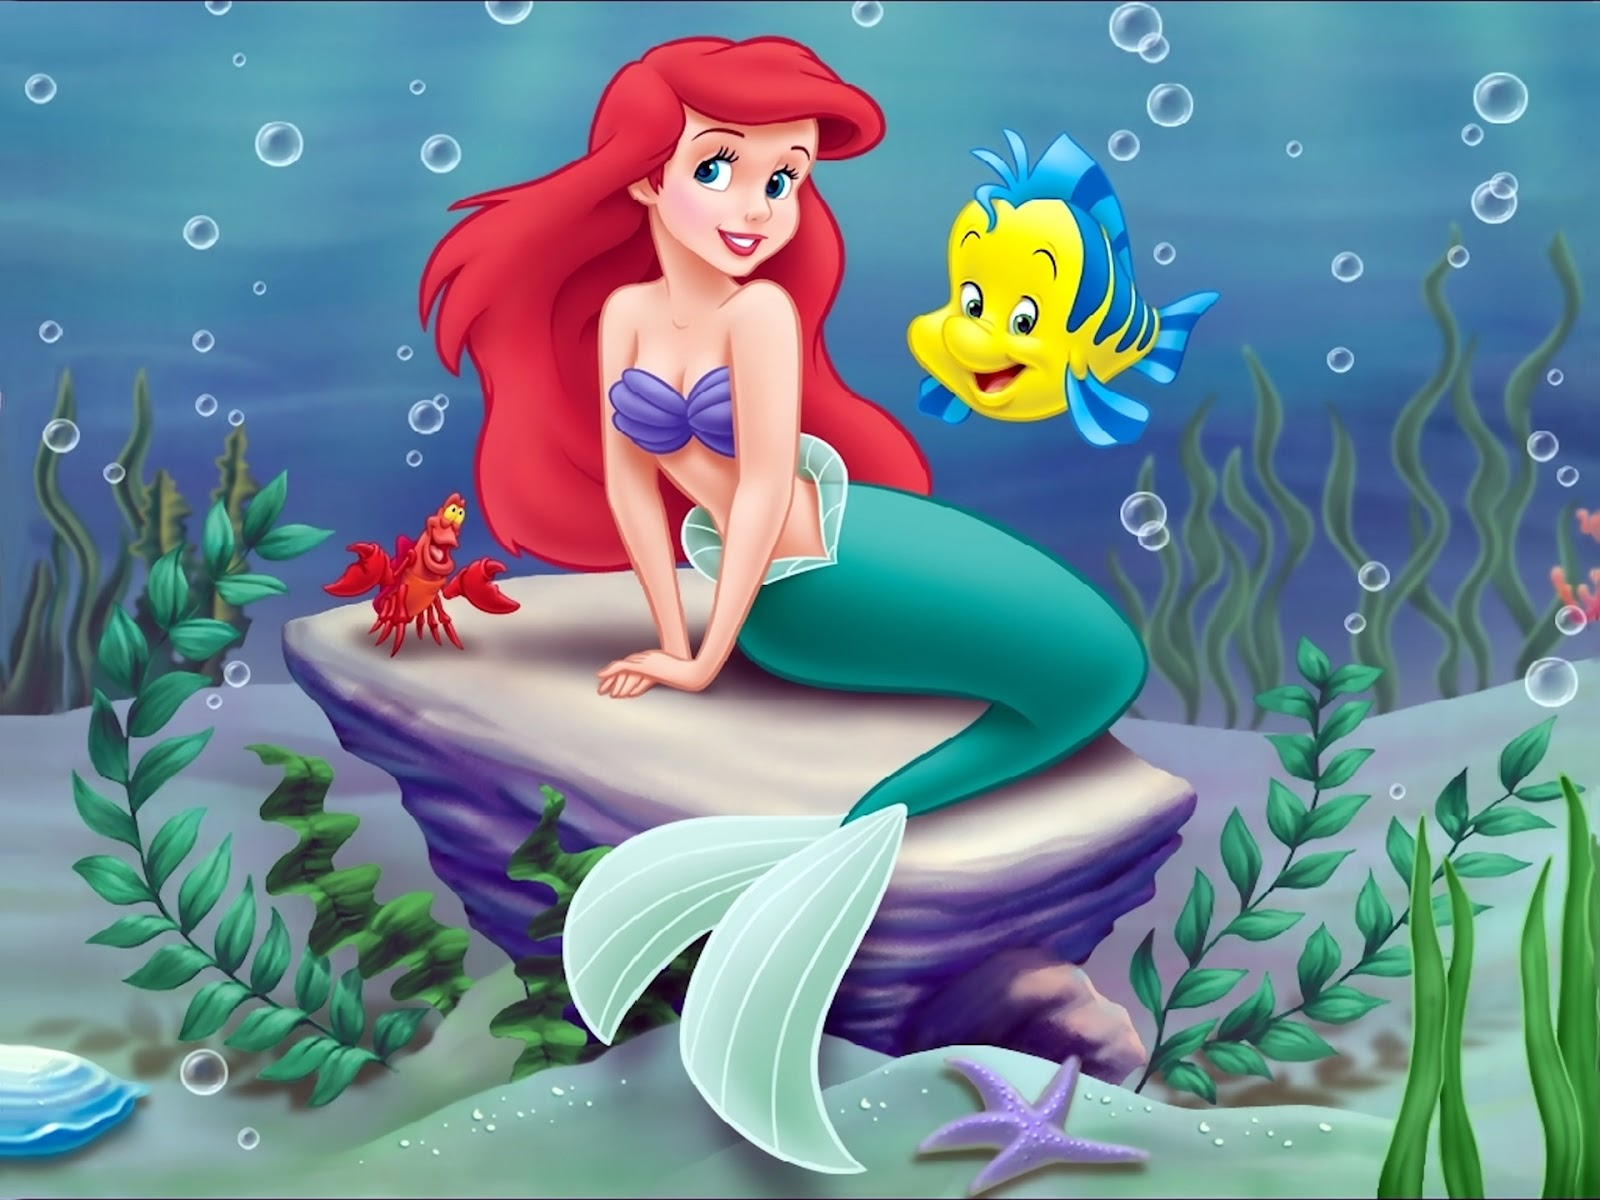 Sofia Coppolas Little Mermaid Might Be The Feminist